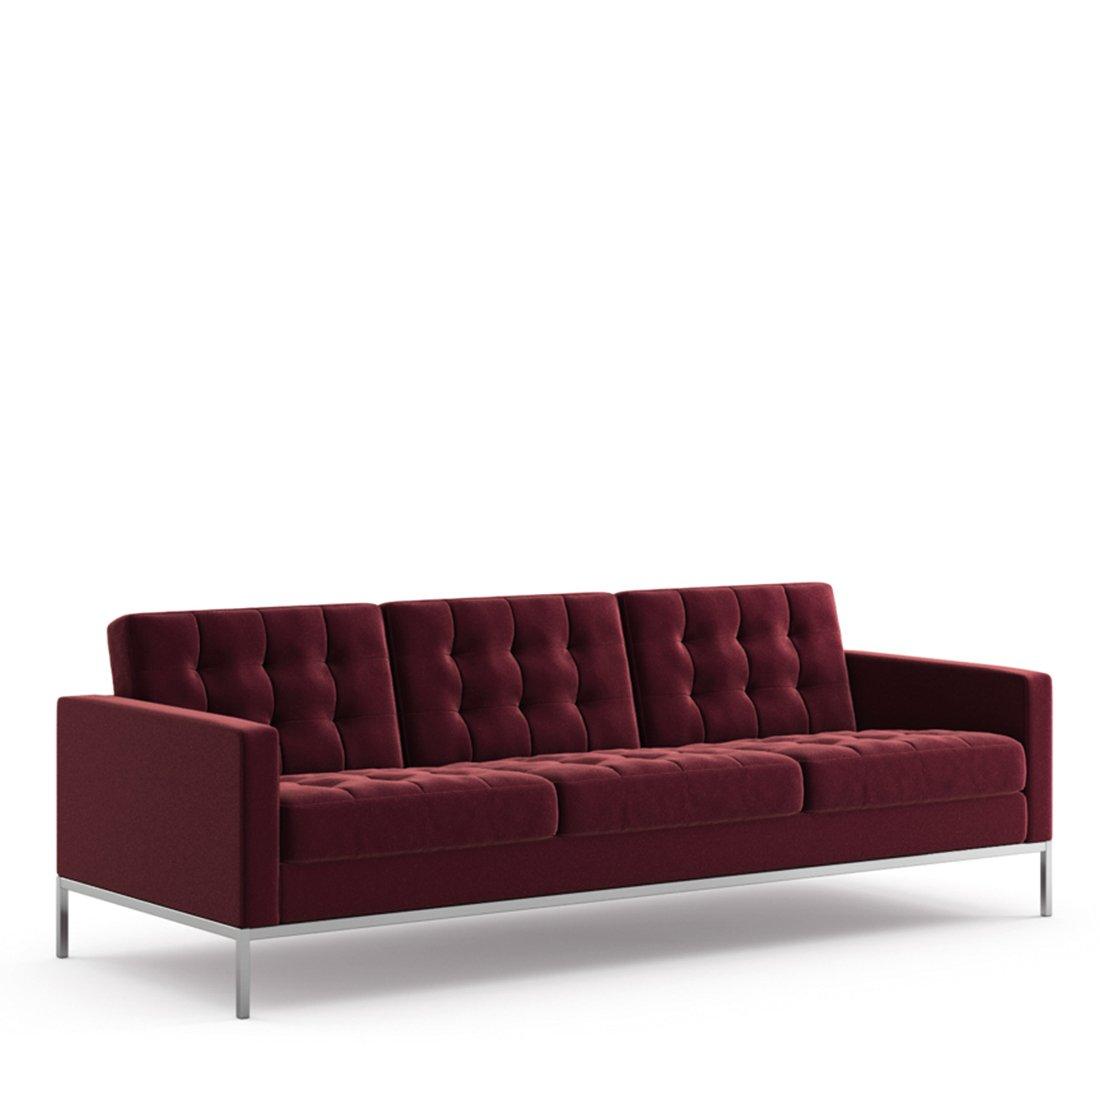 Knoll Florence Knoll Sofa (Relax) 3-zits - Velvet Wine